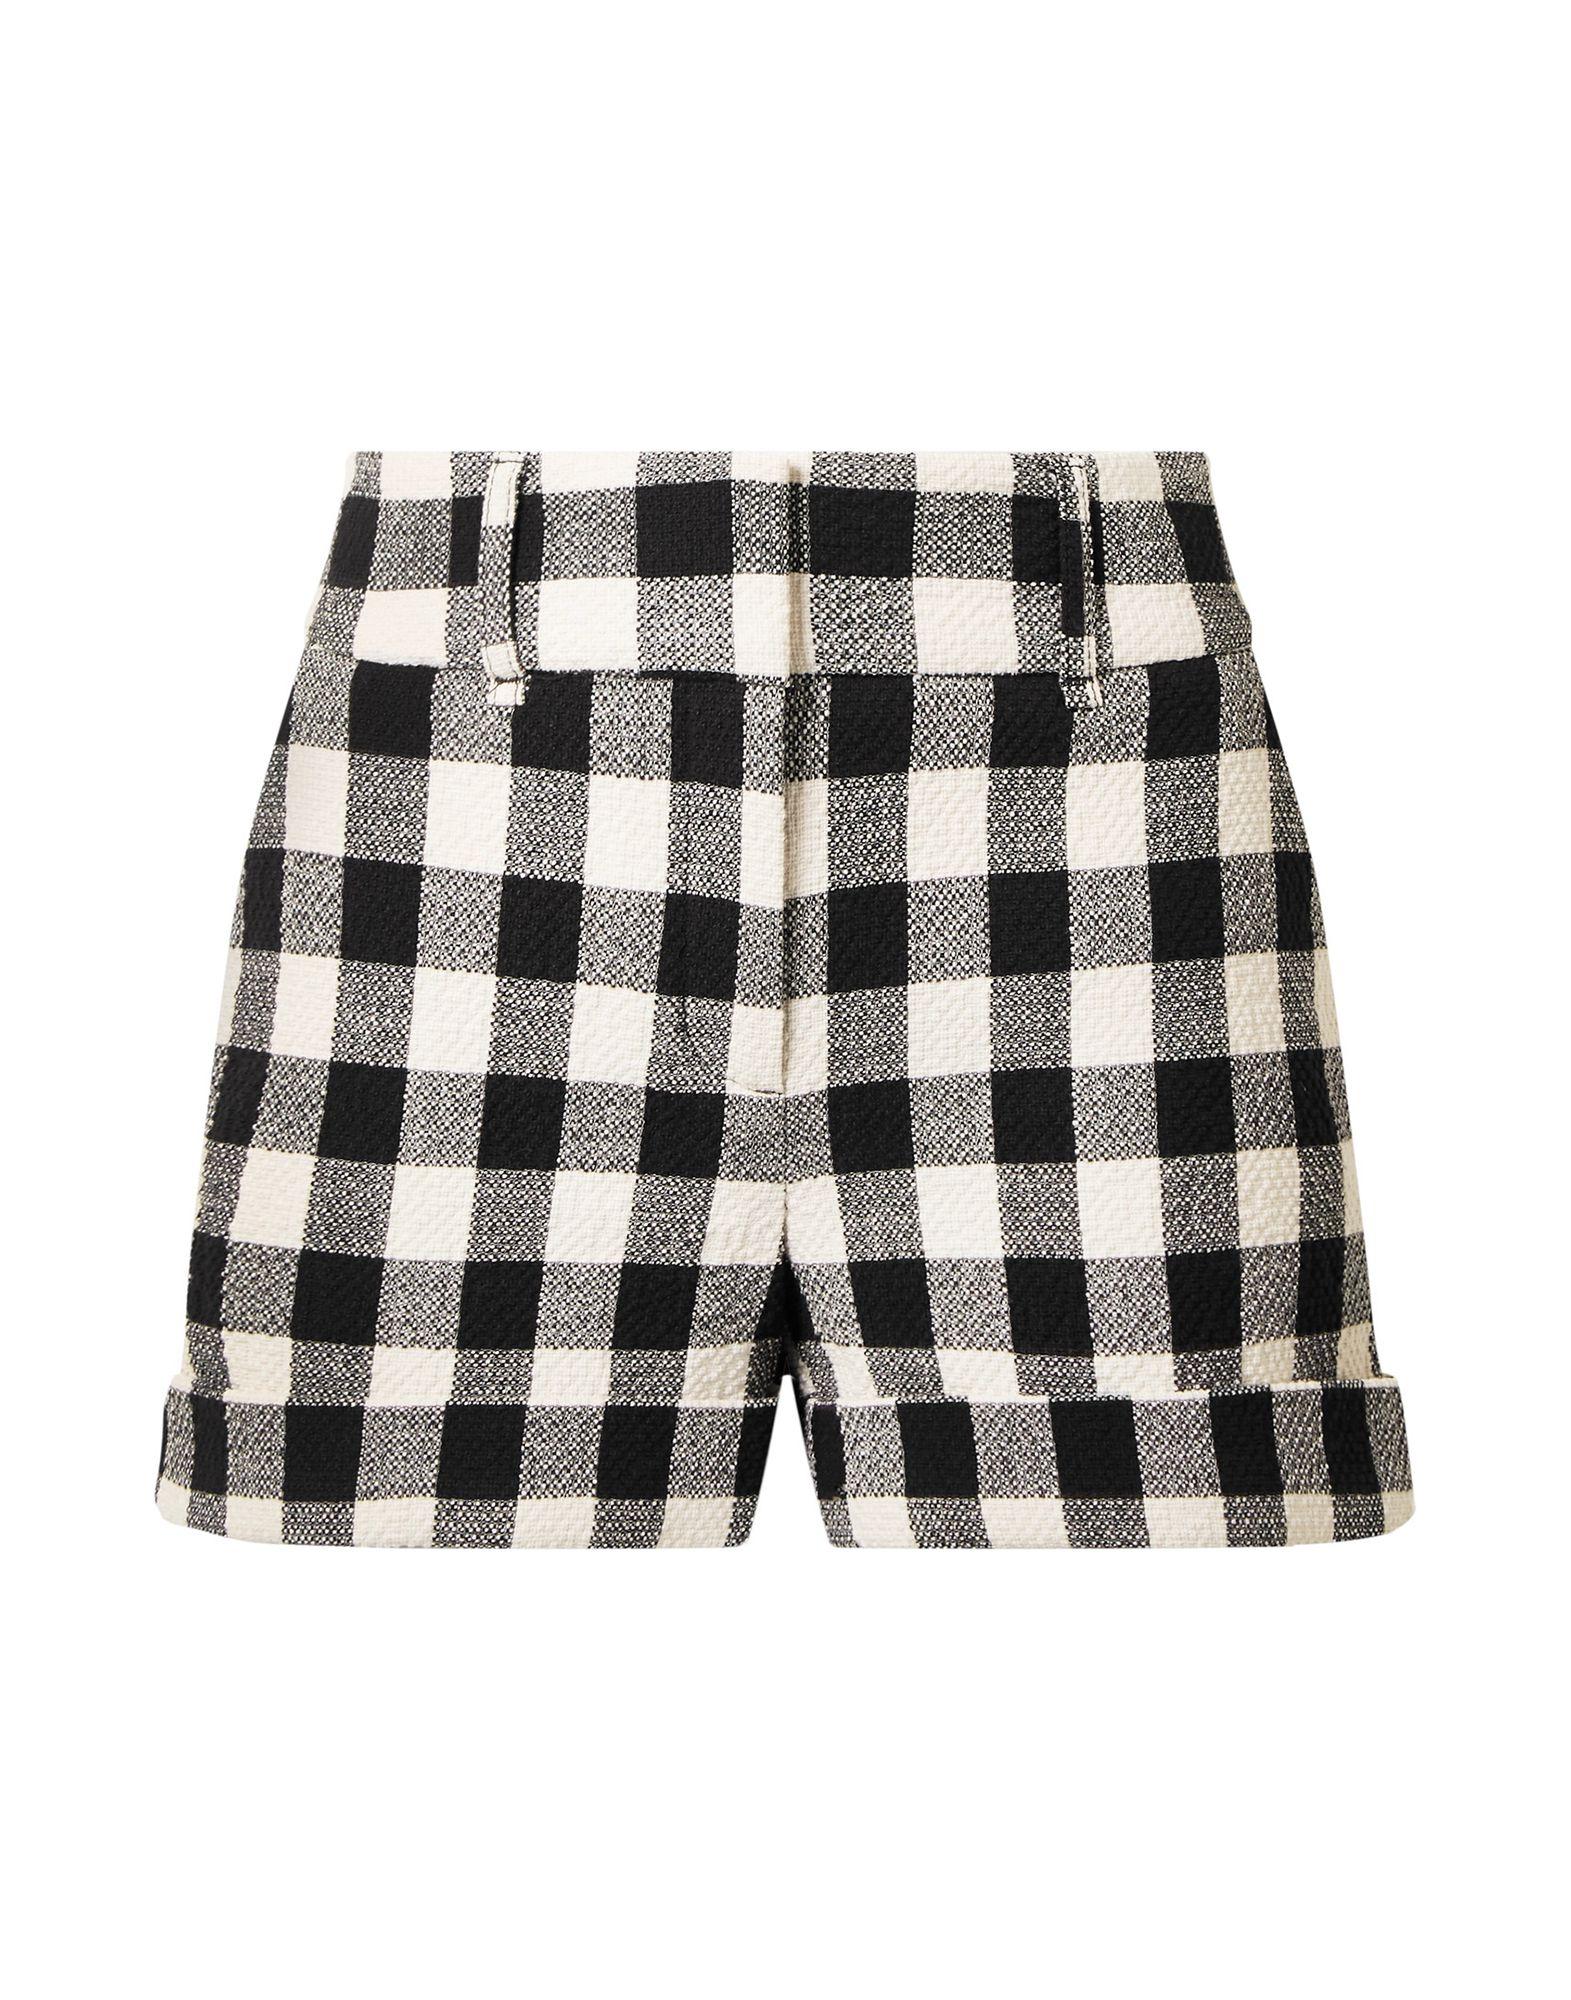 VERONICA BEARD Shorts. tweed, no appliqués, checked, mid rise, hook-and-bar, zip, multipockets, cuffed hems. 99% Cotton, 1% Elastane